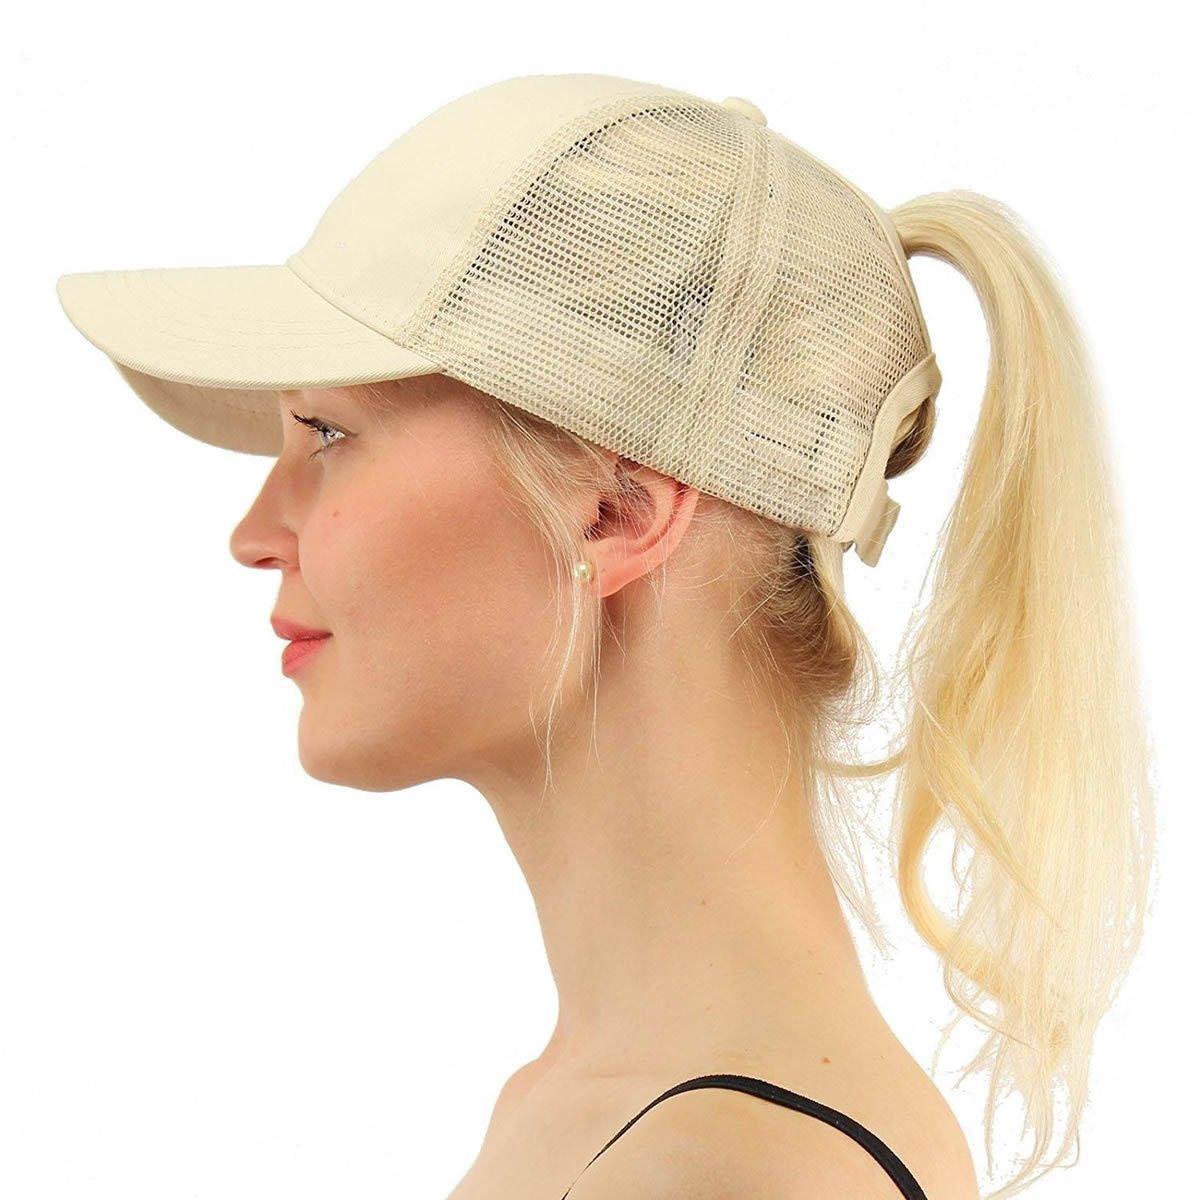 energi8 _ ZQ 1pcs高夏のponycap Messy調節可能メッシュベージュTrucker野球ポニーテールSun Hat   B07CHX9D1K